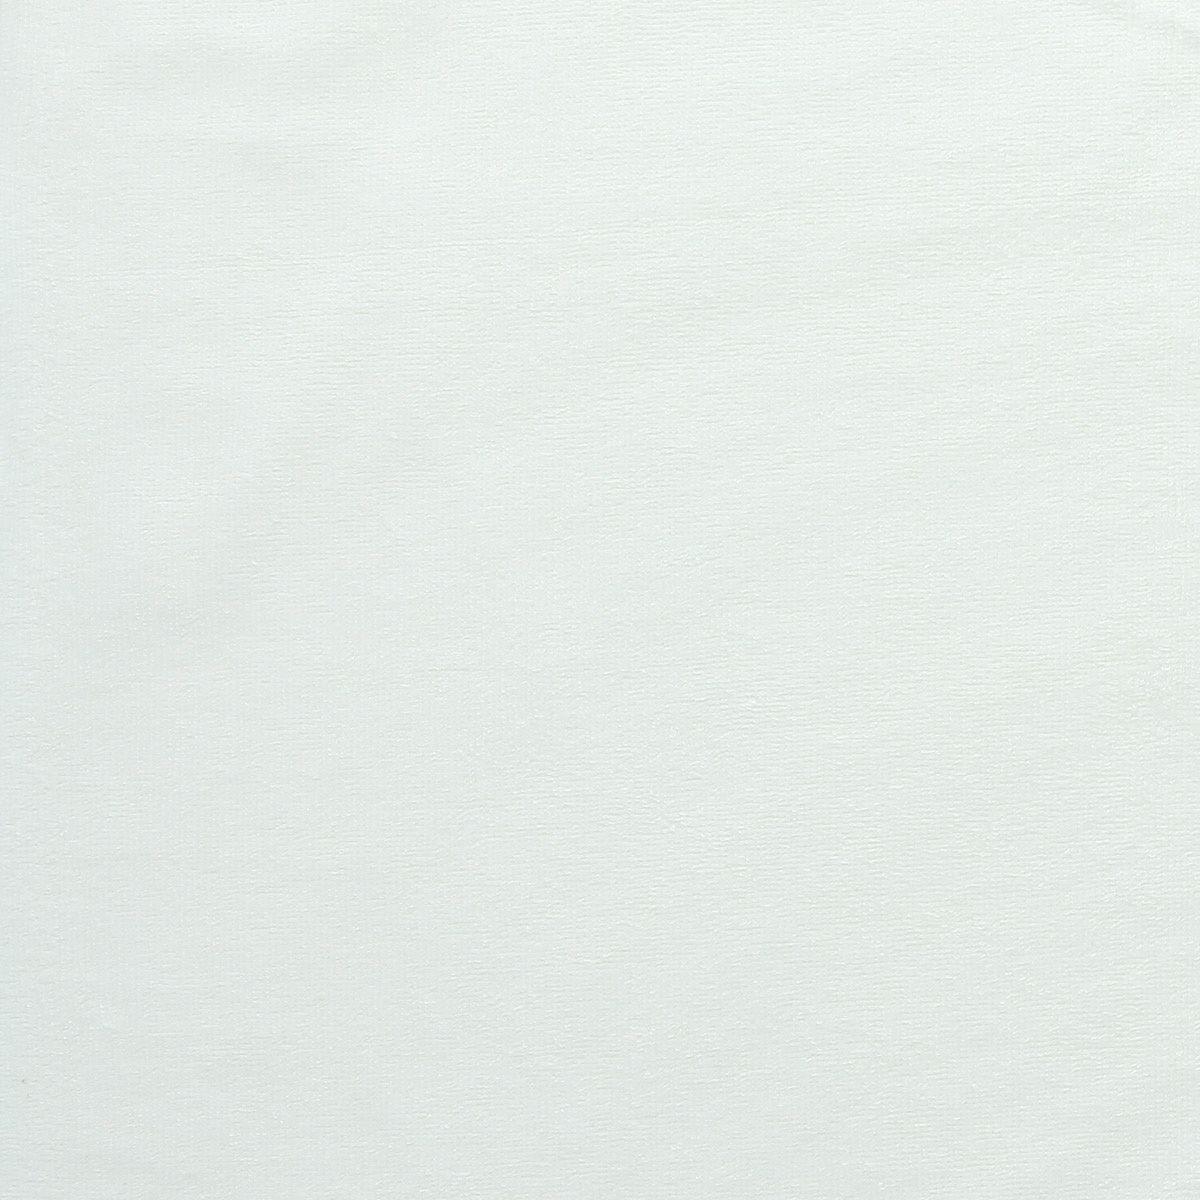 Tissu micro éponge de bambou - Blanc